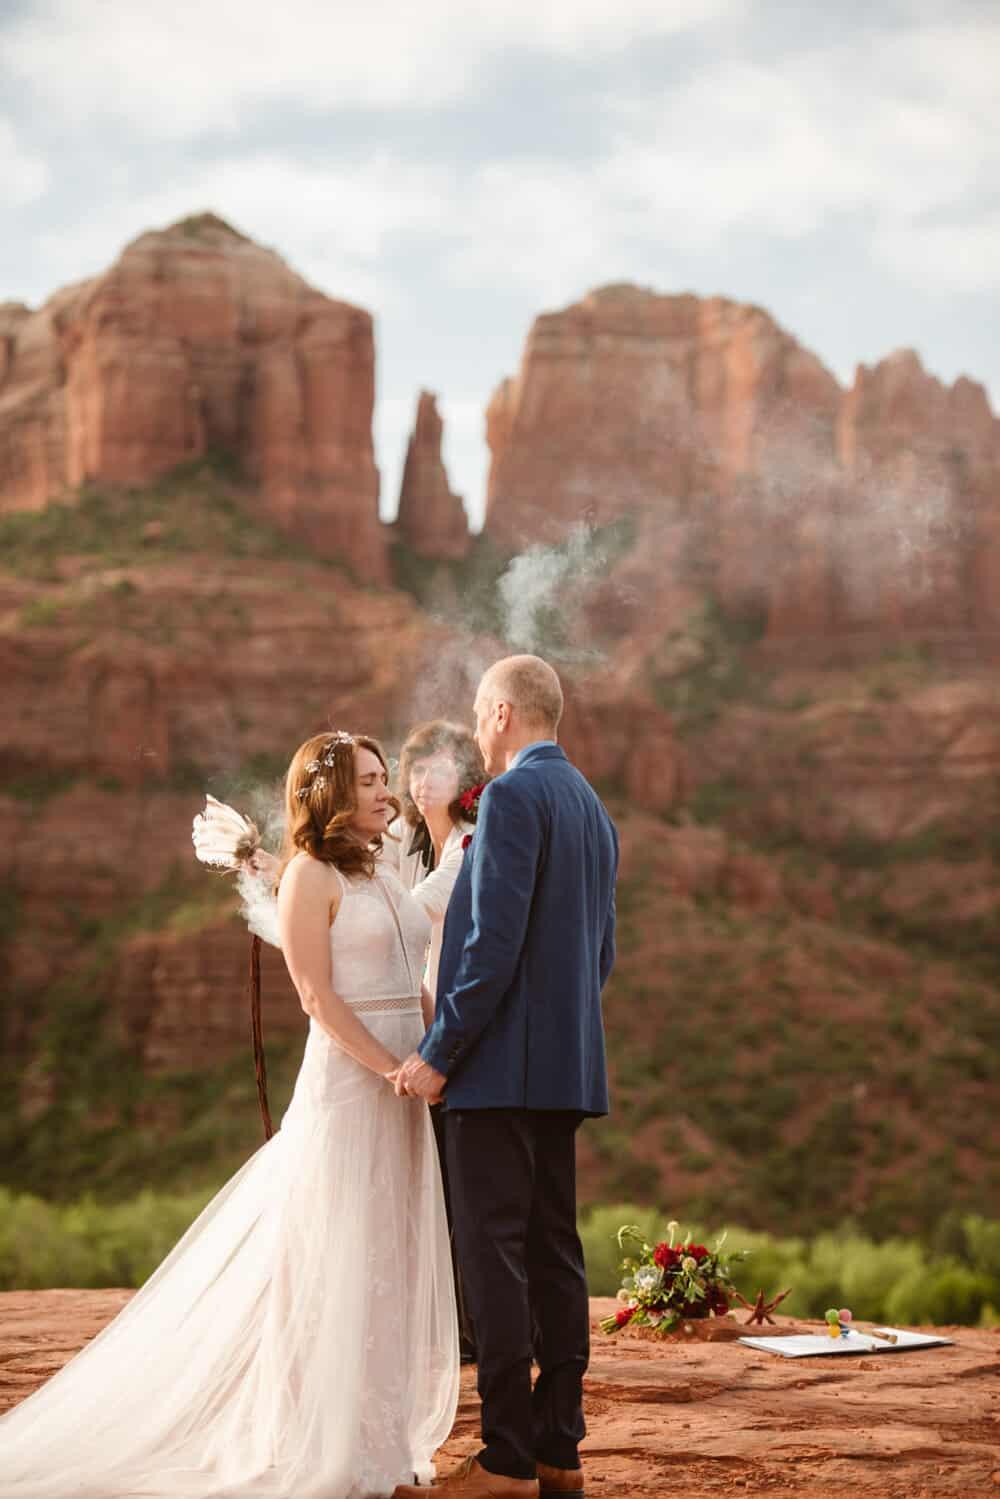 sage-smudging-wedding-ceremony